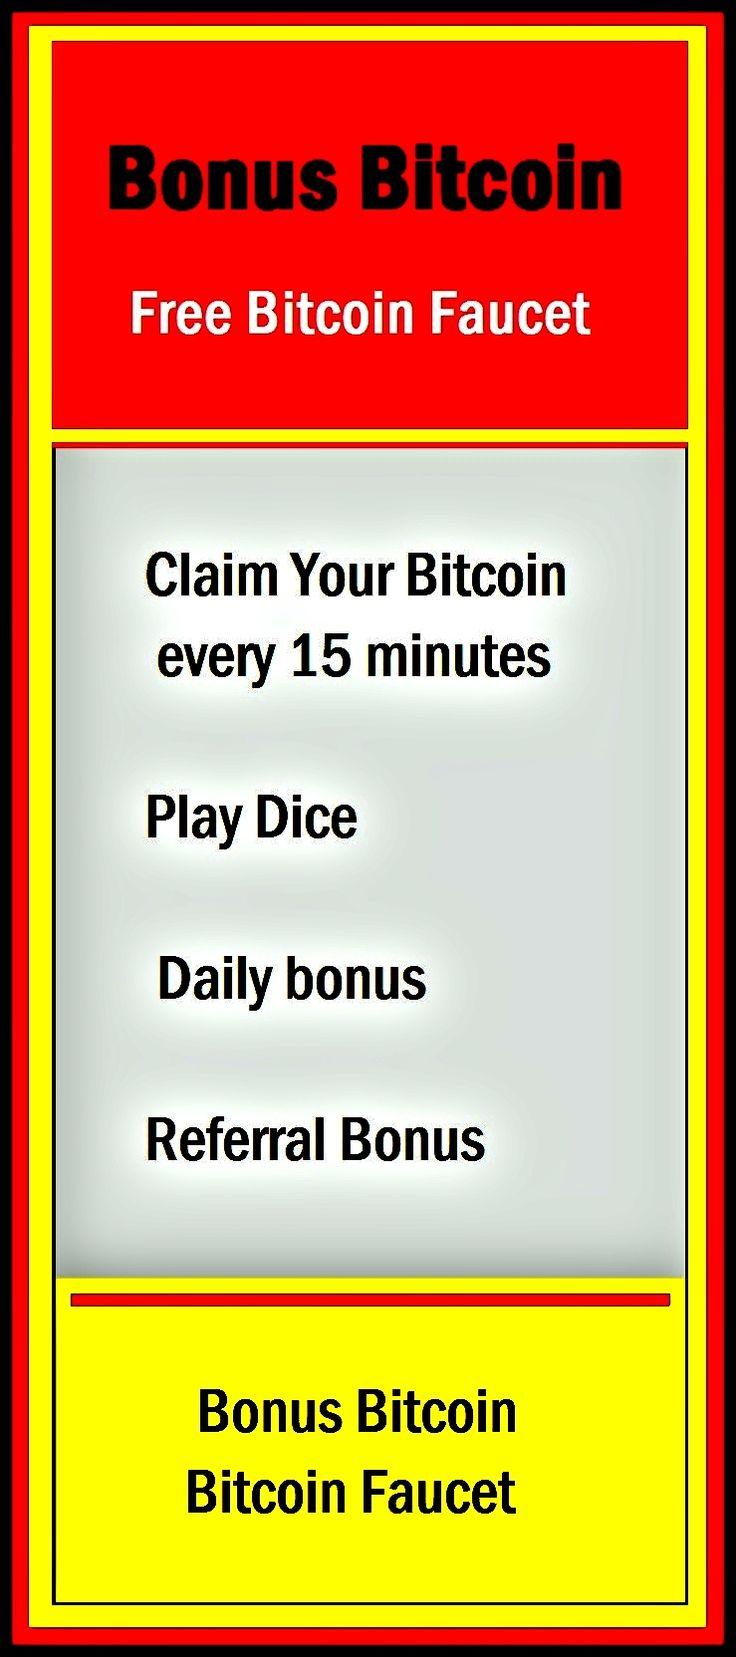 Bitcoin faucet list reddit : Bitcoin user base growth